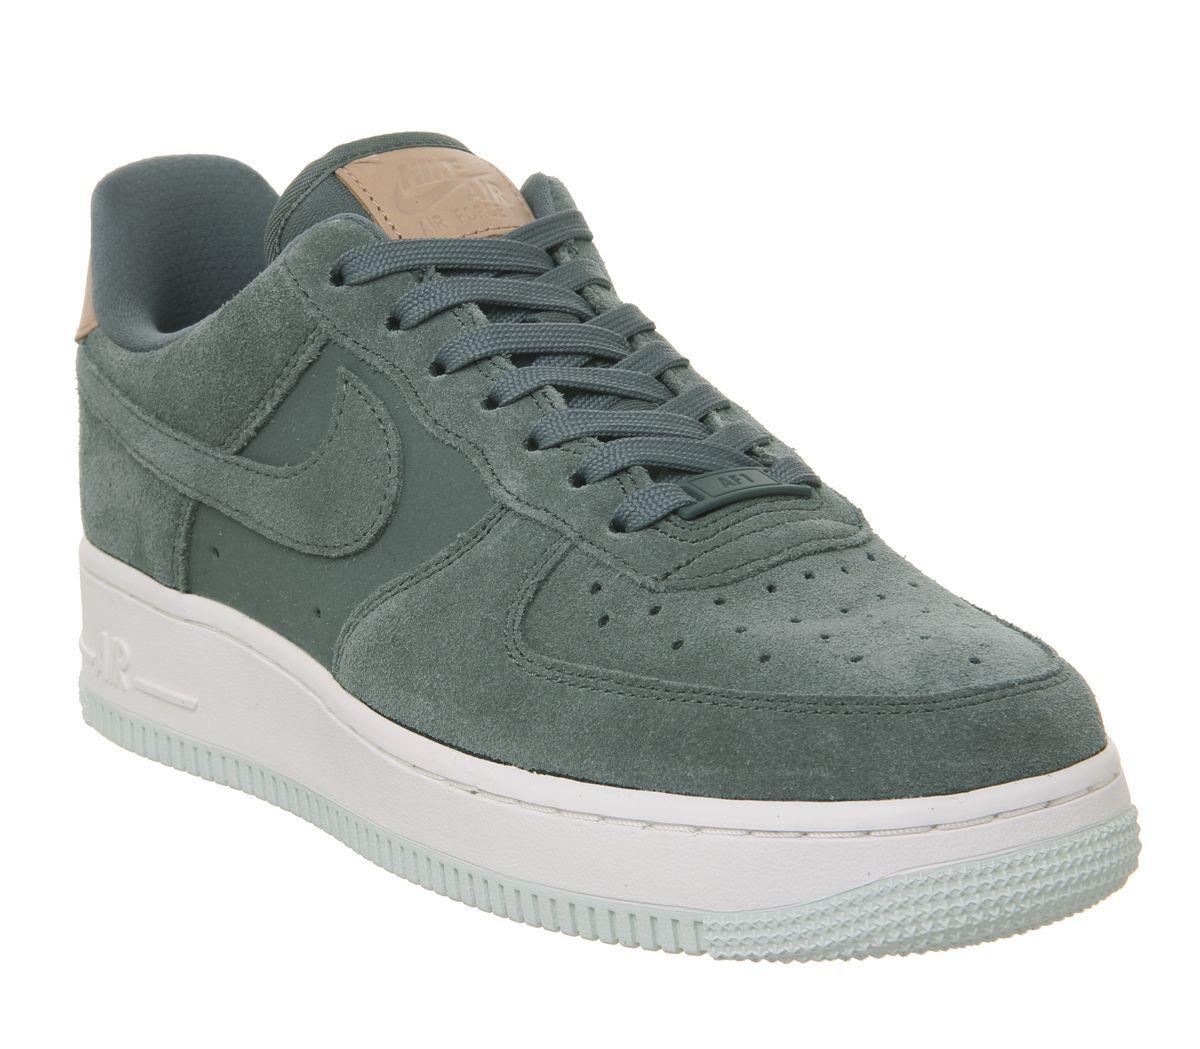 Air Force 1 07 Trainers   Shoe city, Nike air force, Nike